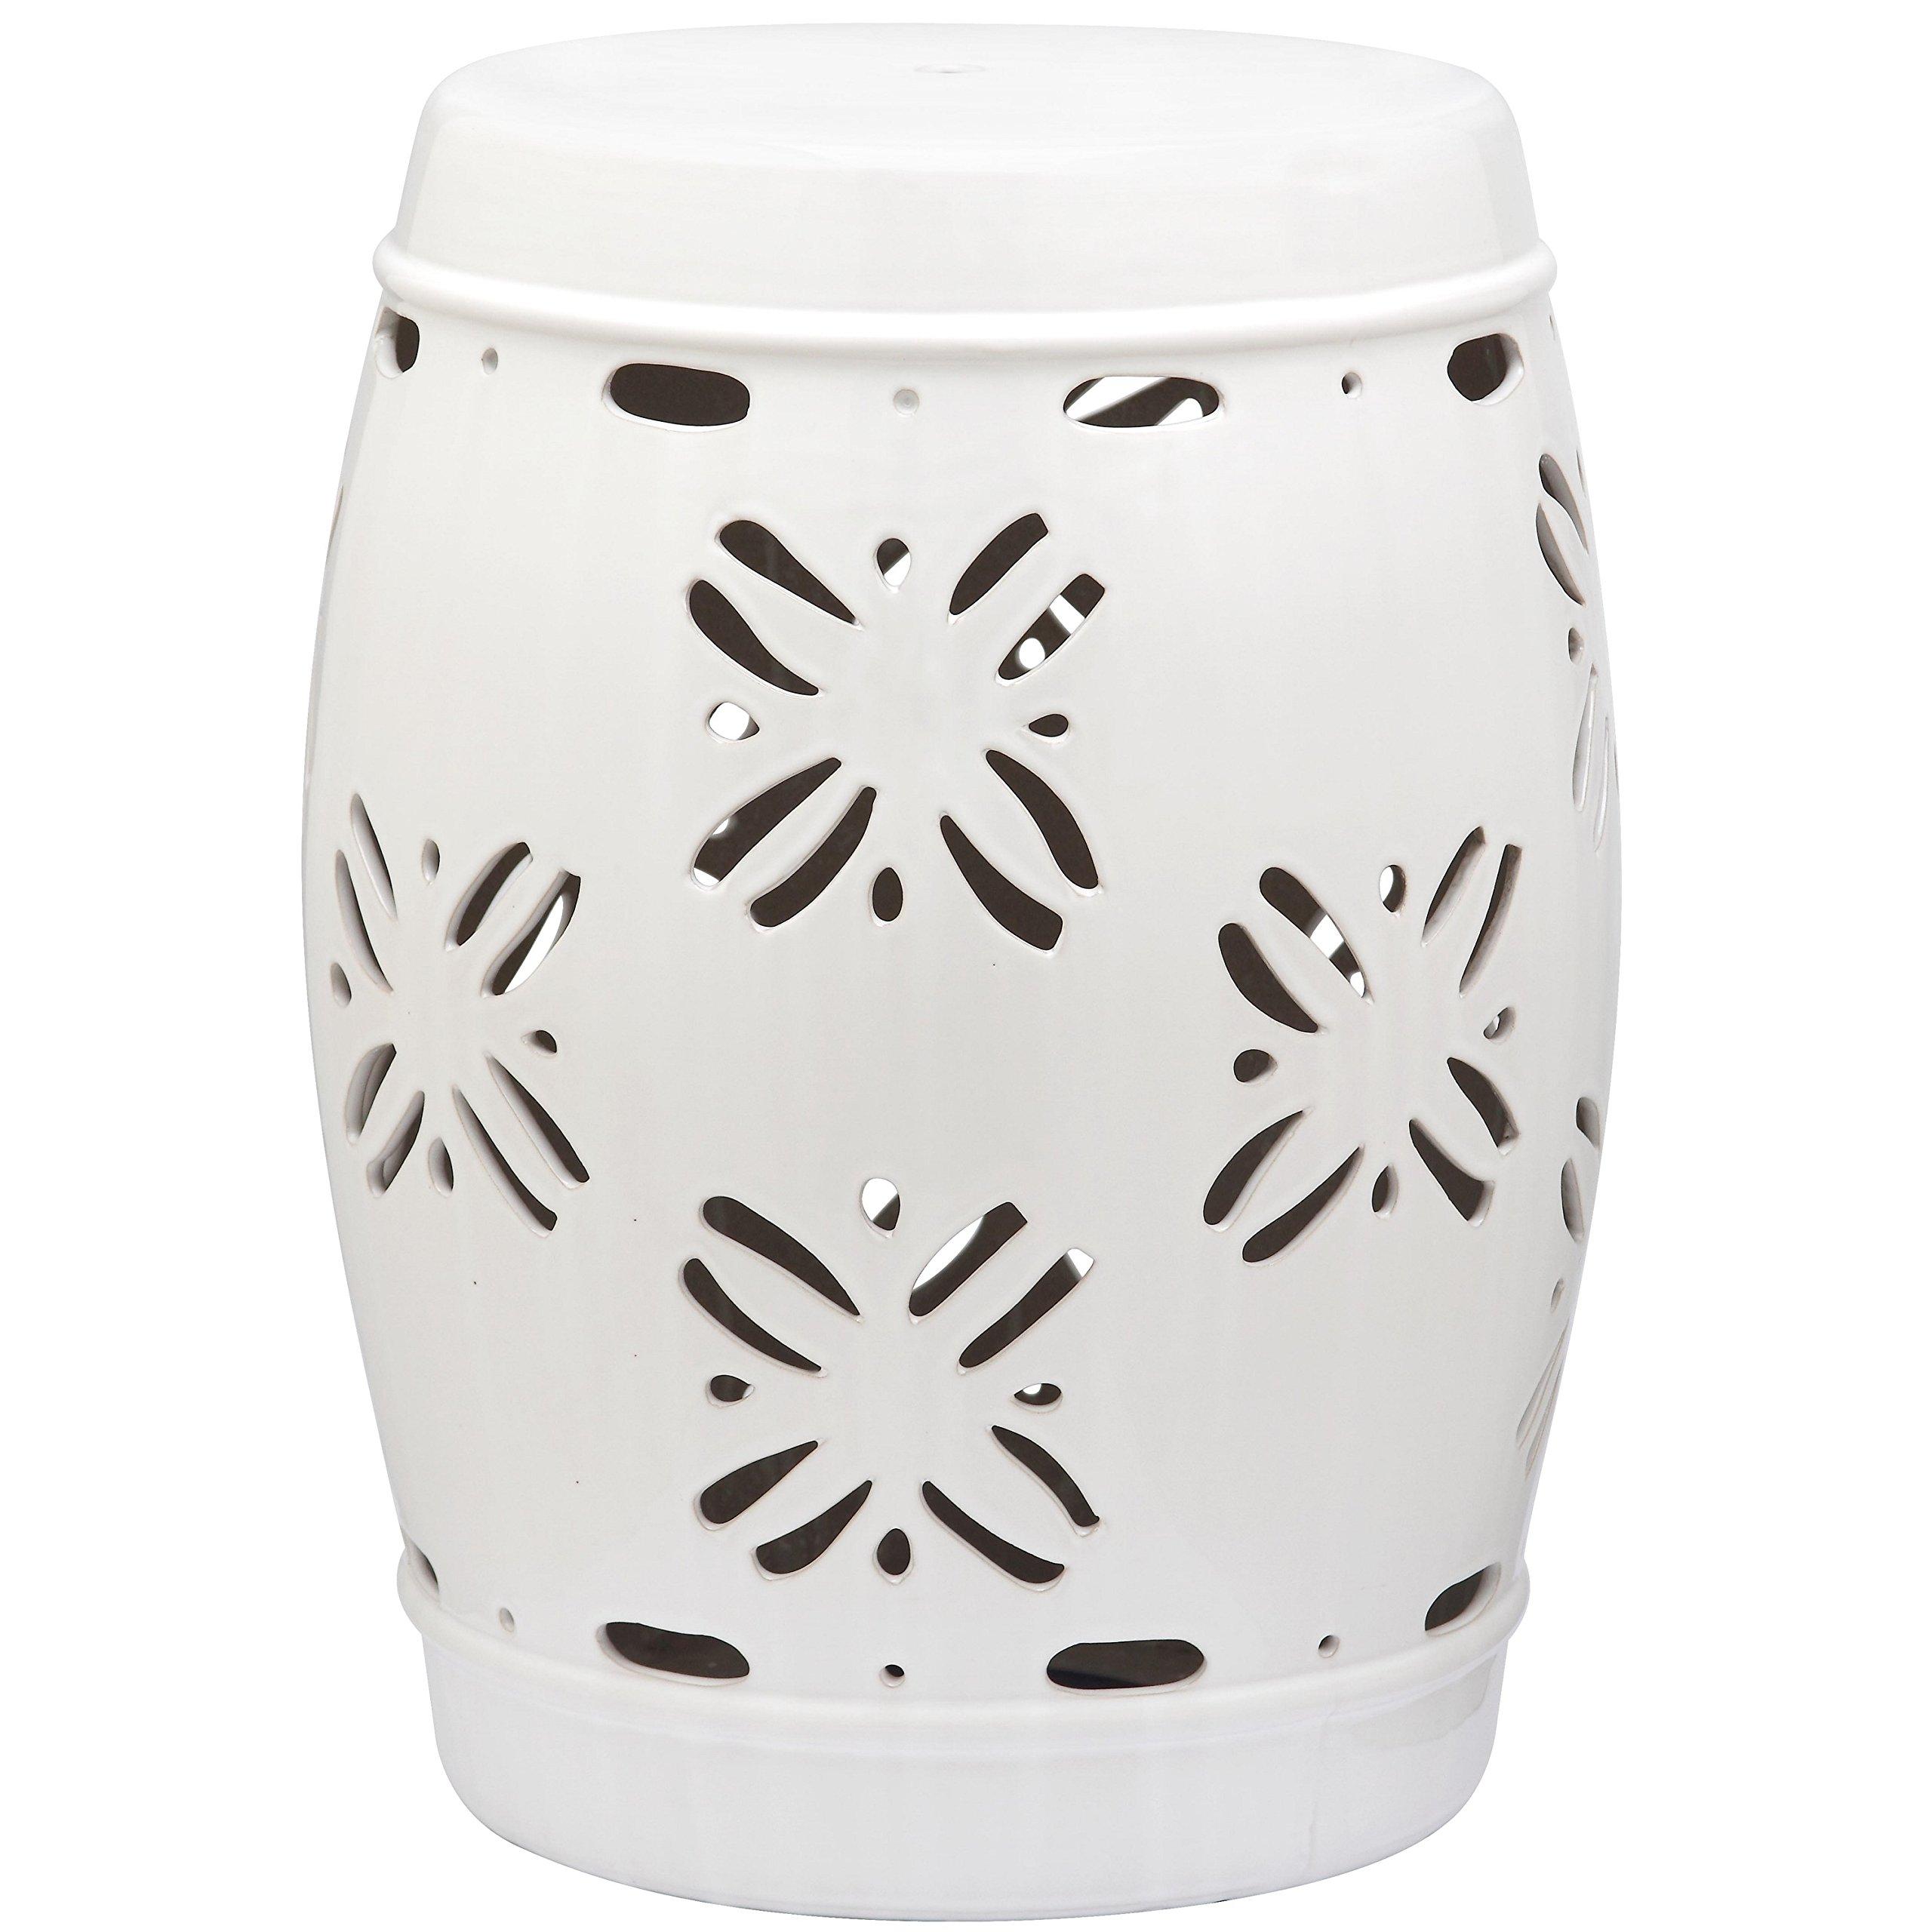 Safavieh Castle Gardens Collection Sakura White Glazed Ceramic Garden Stool